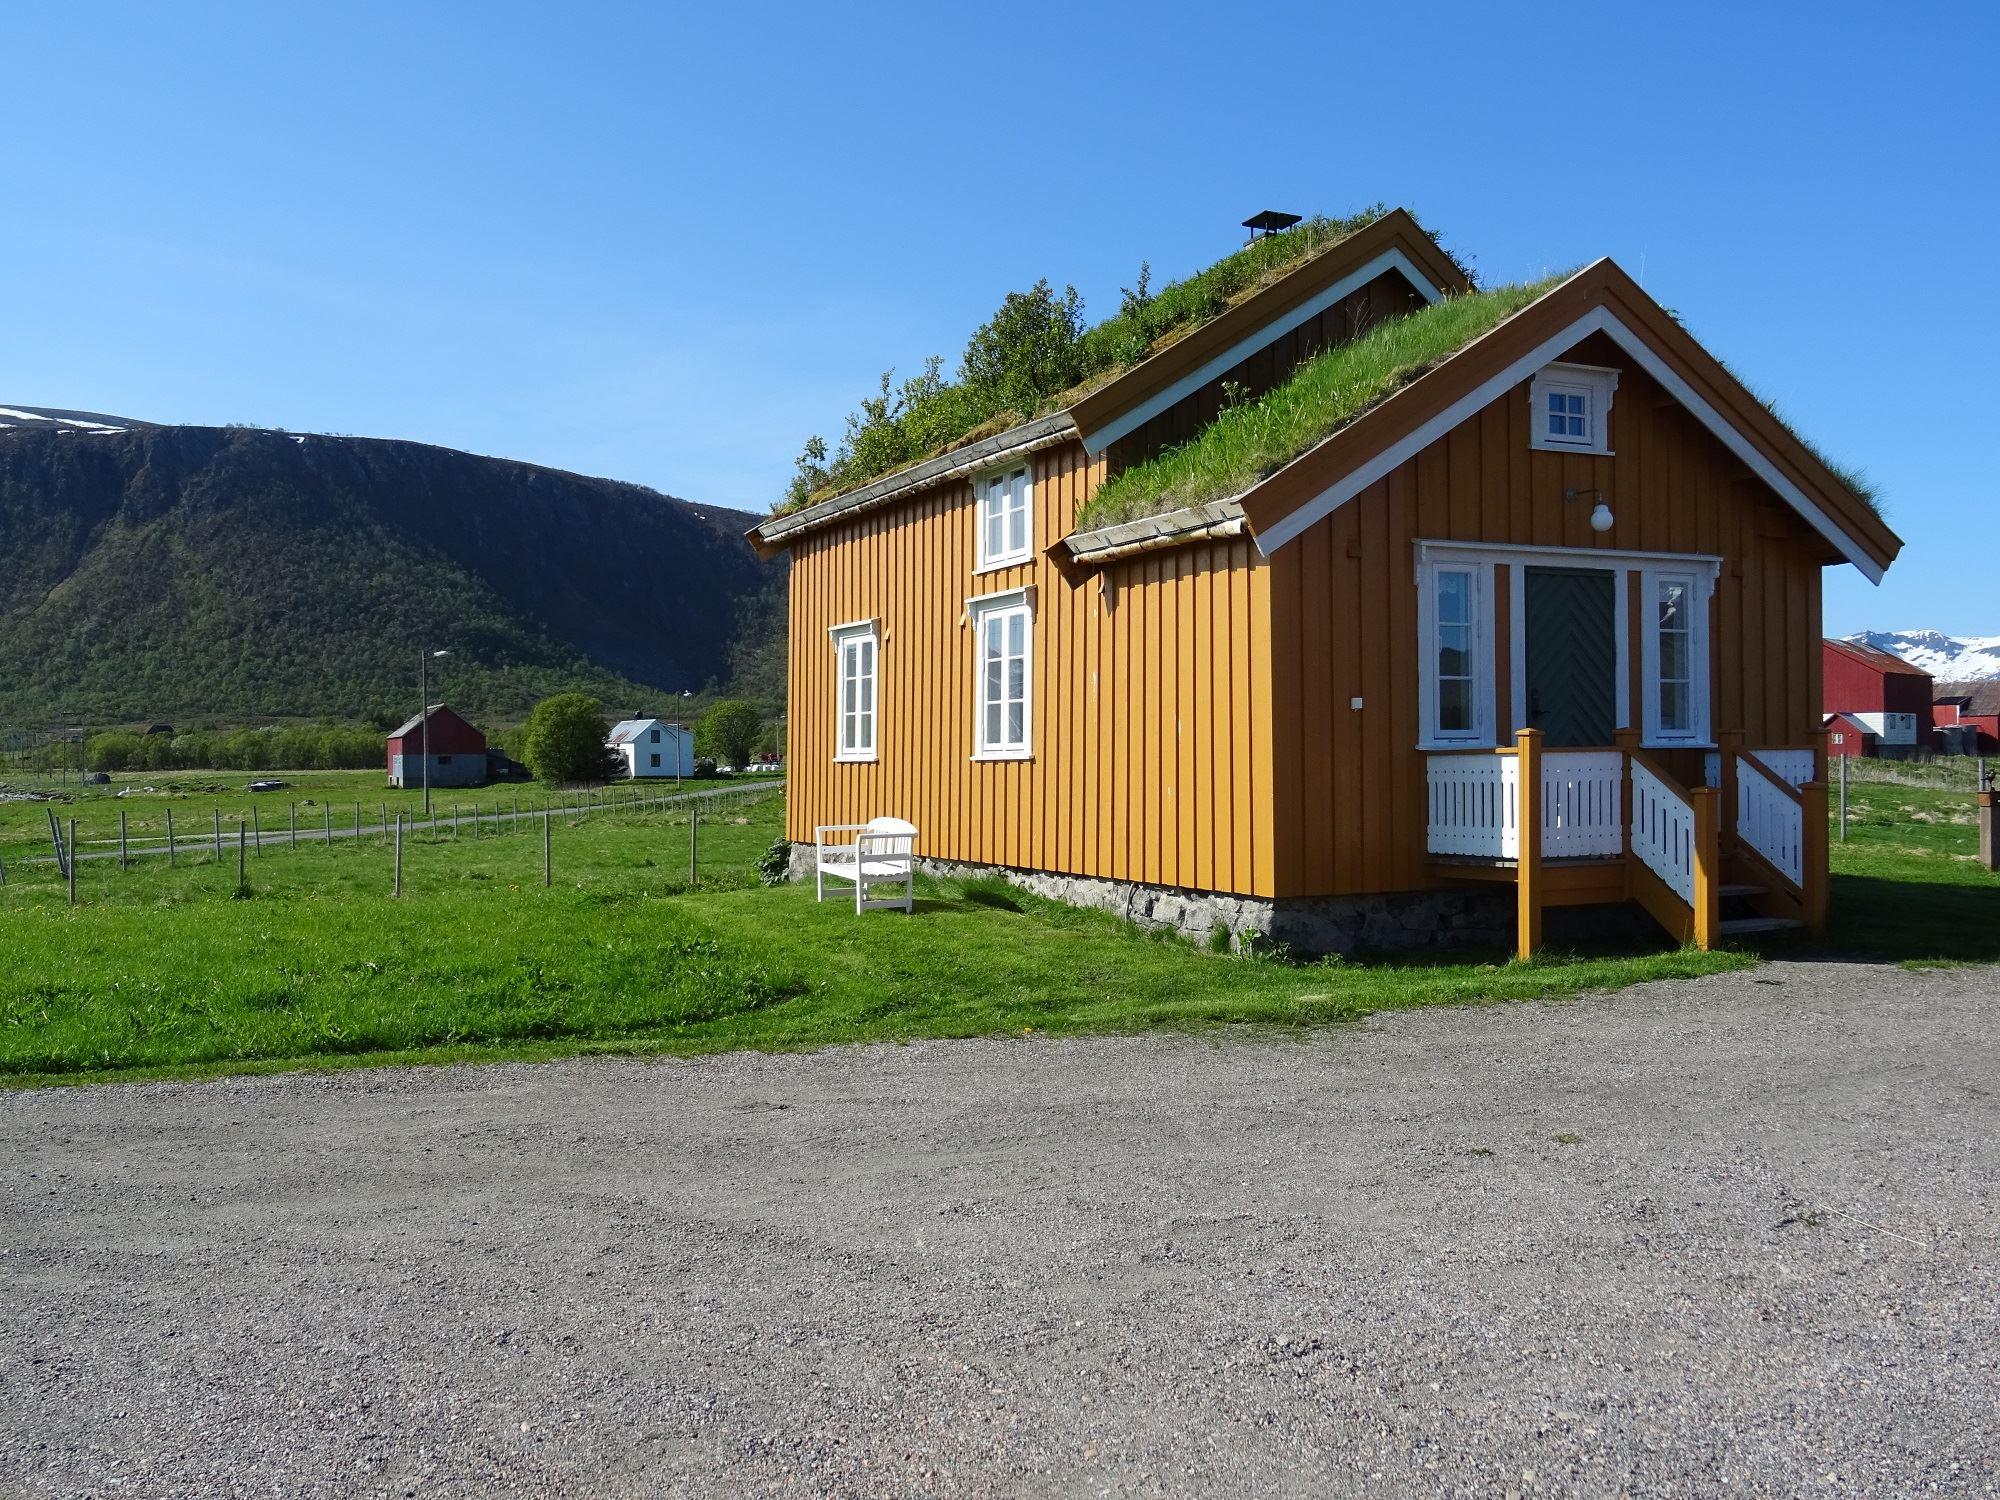 The Yellow house,Lovik, Andøy,Vesterålen